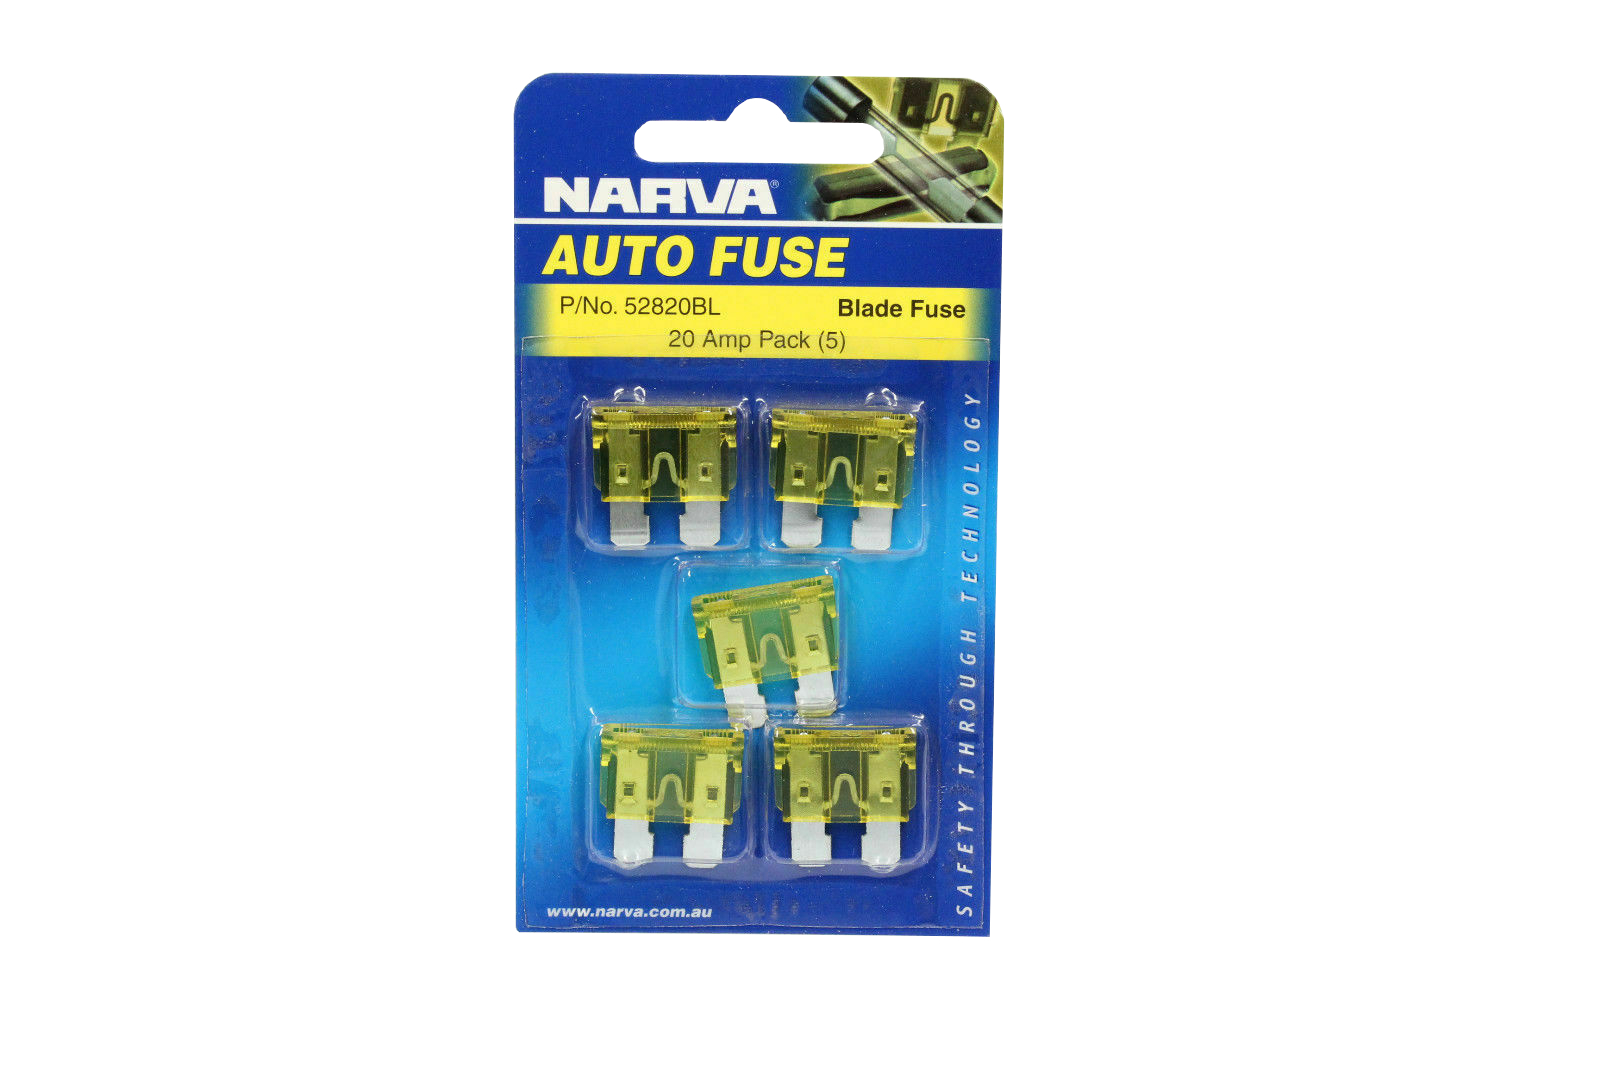 NARVA 20 Amp YELLOW ATS Blade Fuse - 5 Per Pack. 52820BL